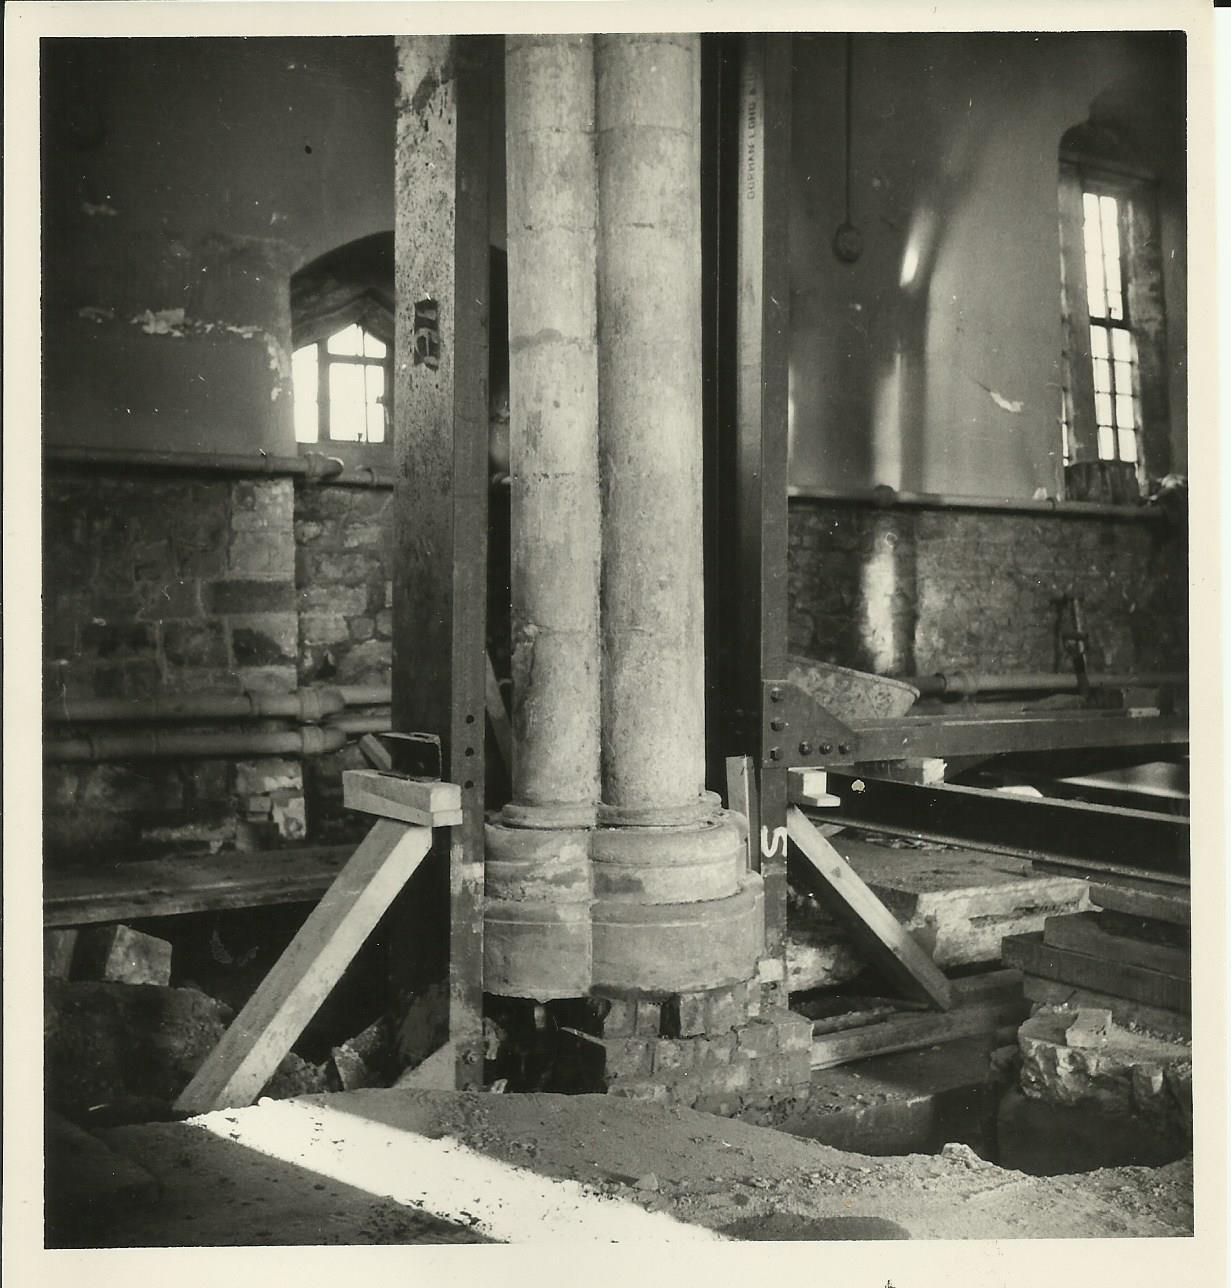 Pillar nearest the bricked in Leper Door in the background